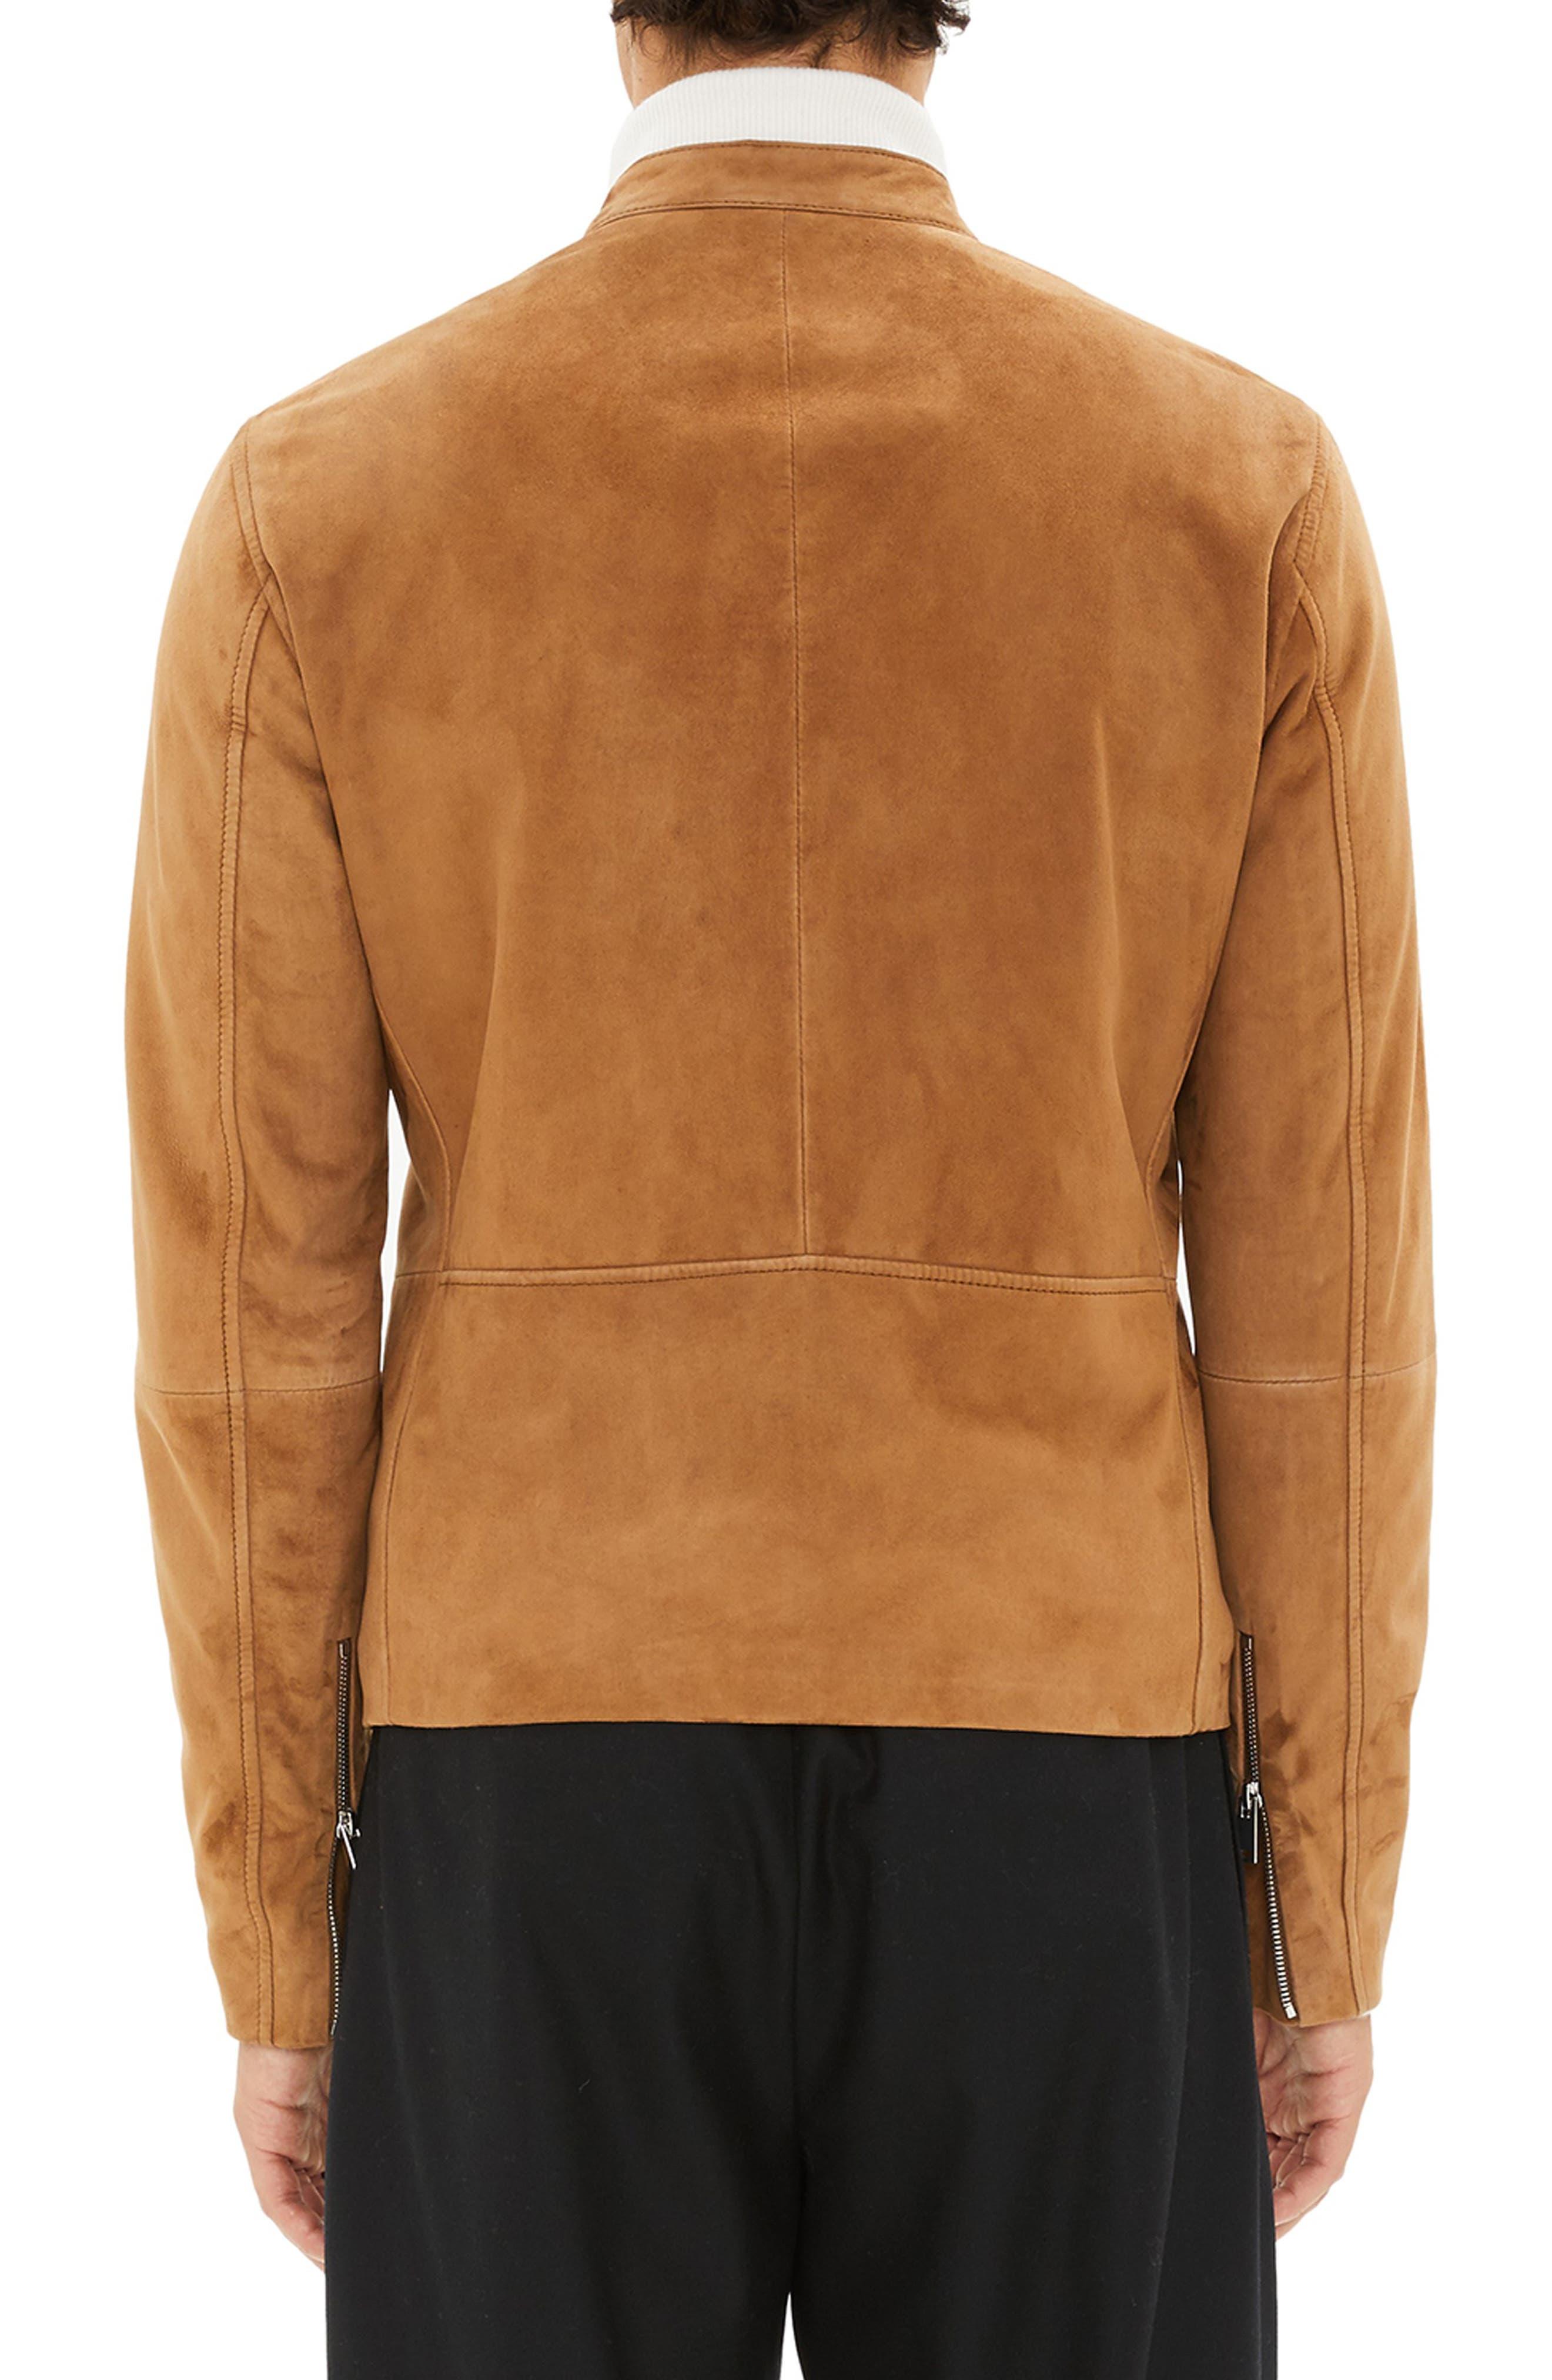 Wynwood Radic Leather Jacket,                             Alternate thumbnail 2, color,                             SANDSTORM